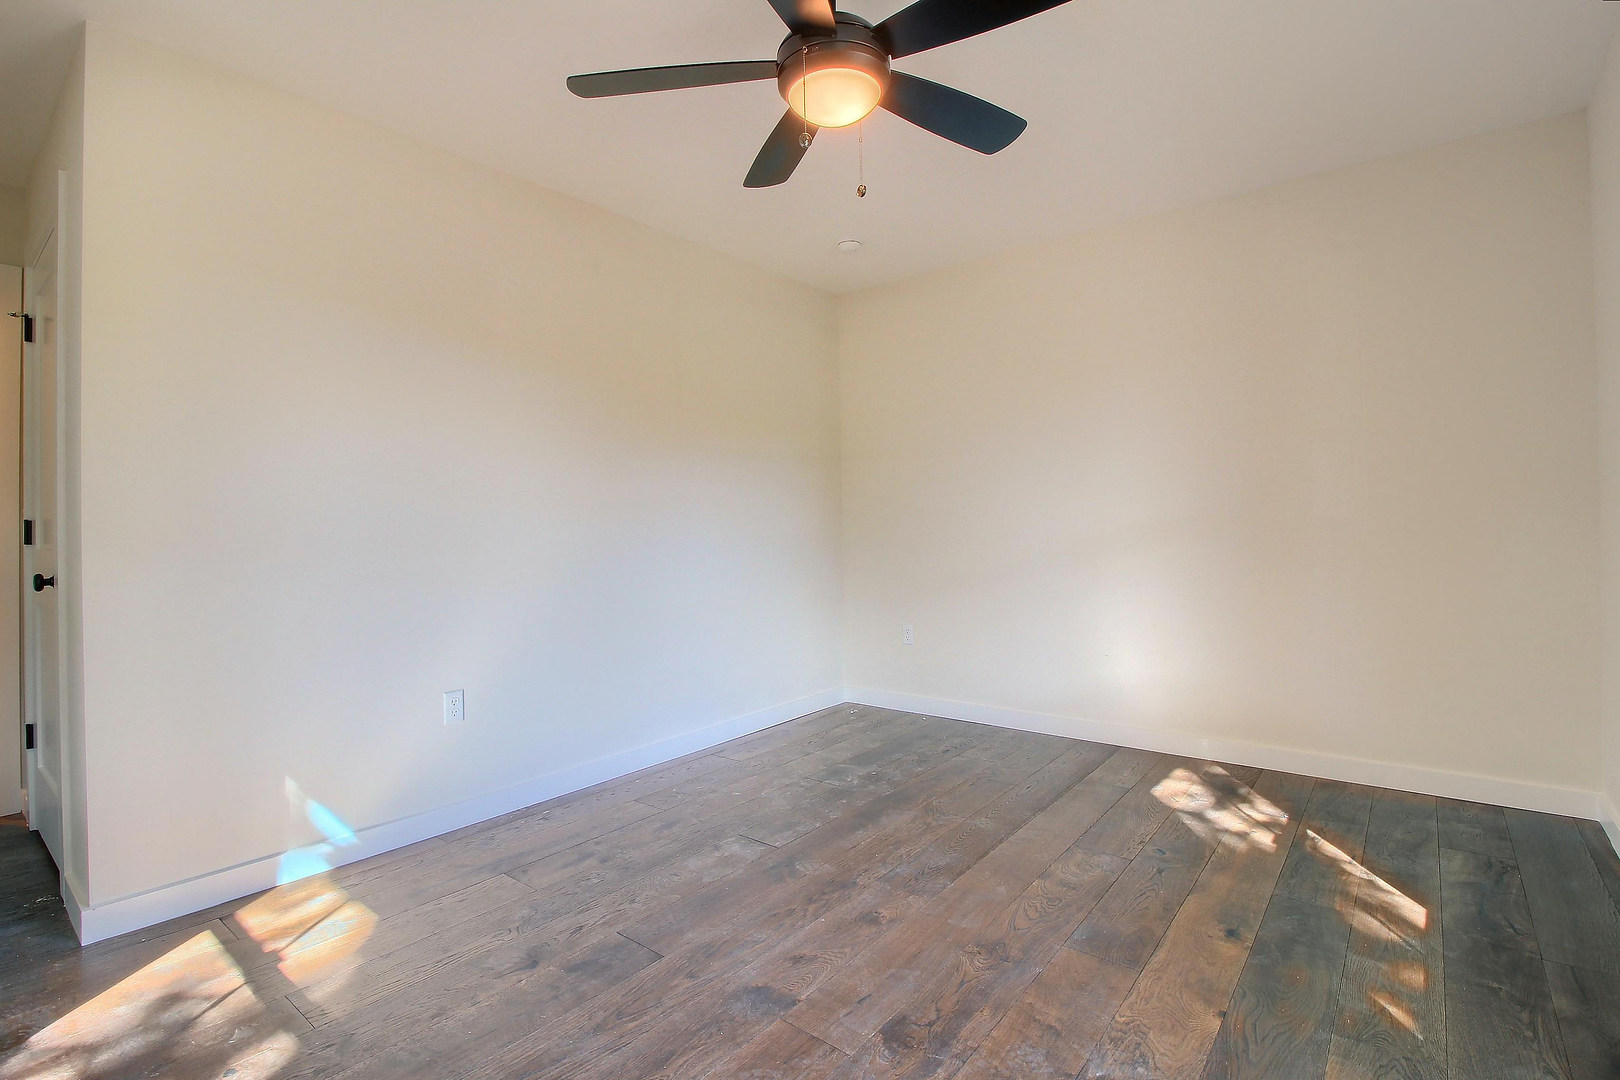 Home Renovation Hardwood Flooring on Bouldin in Austin, TX